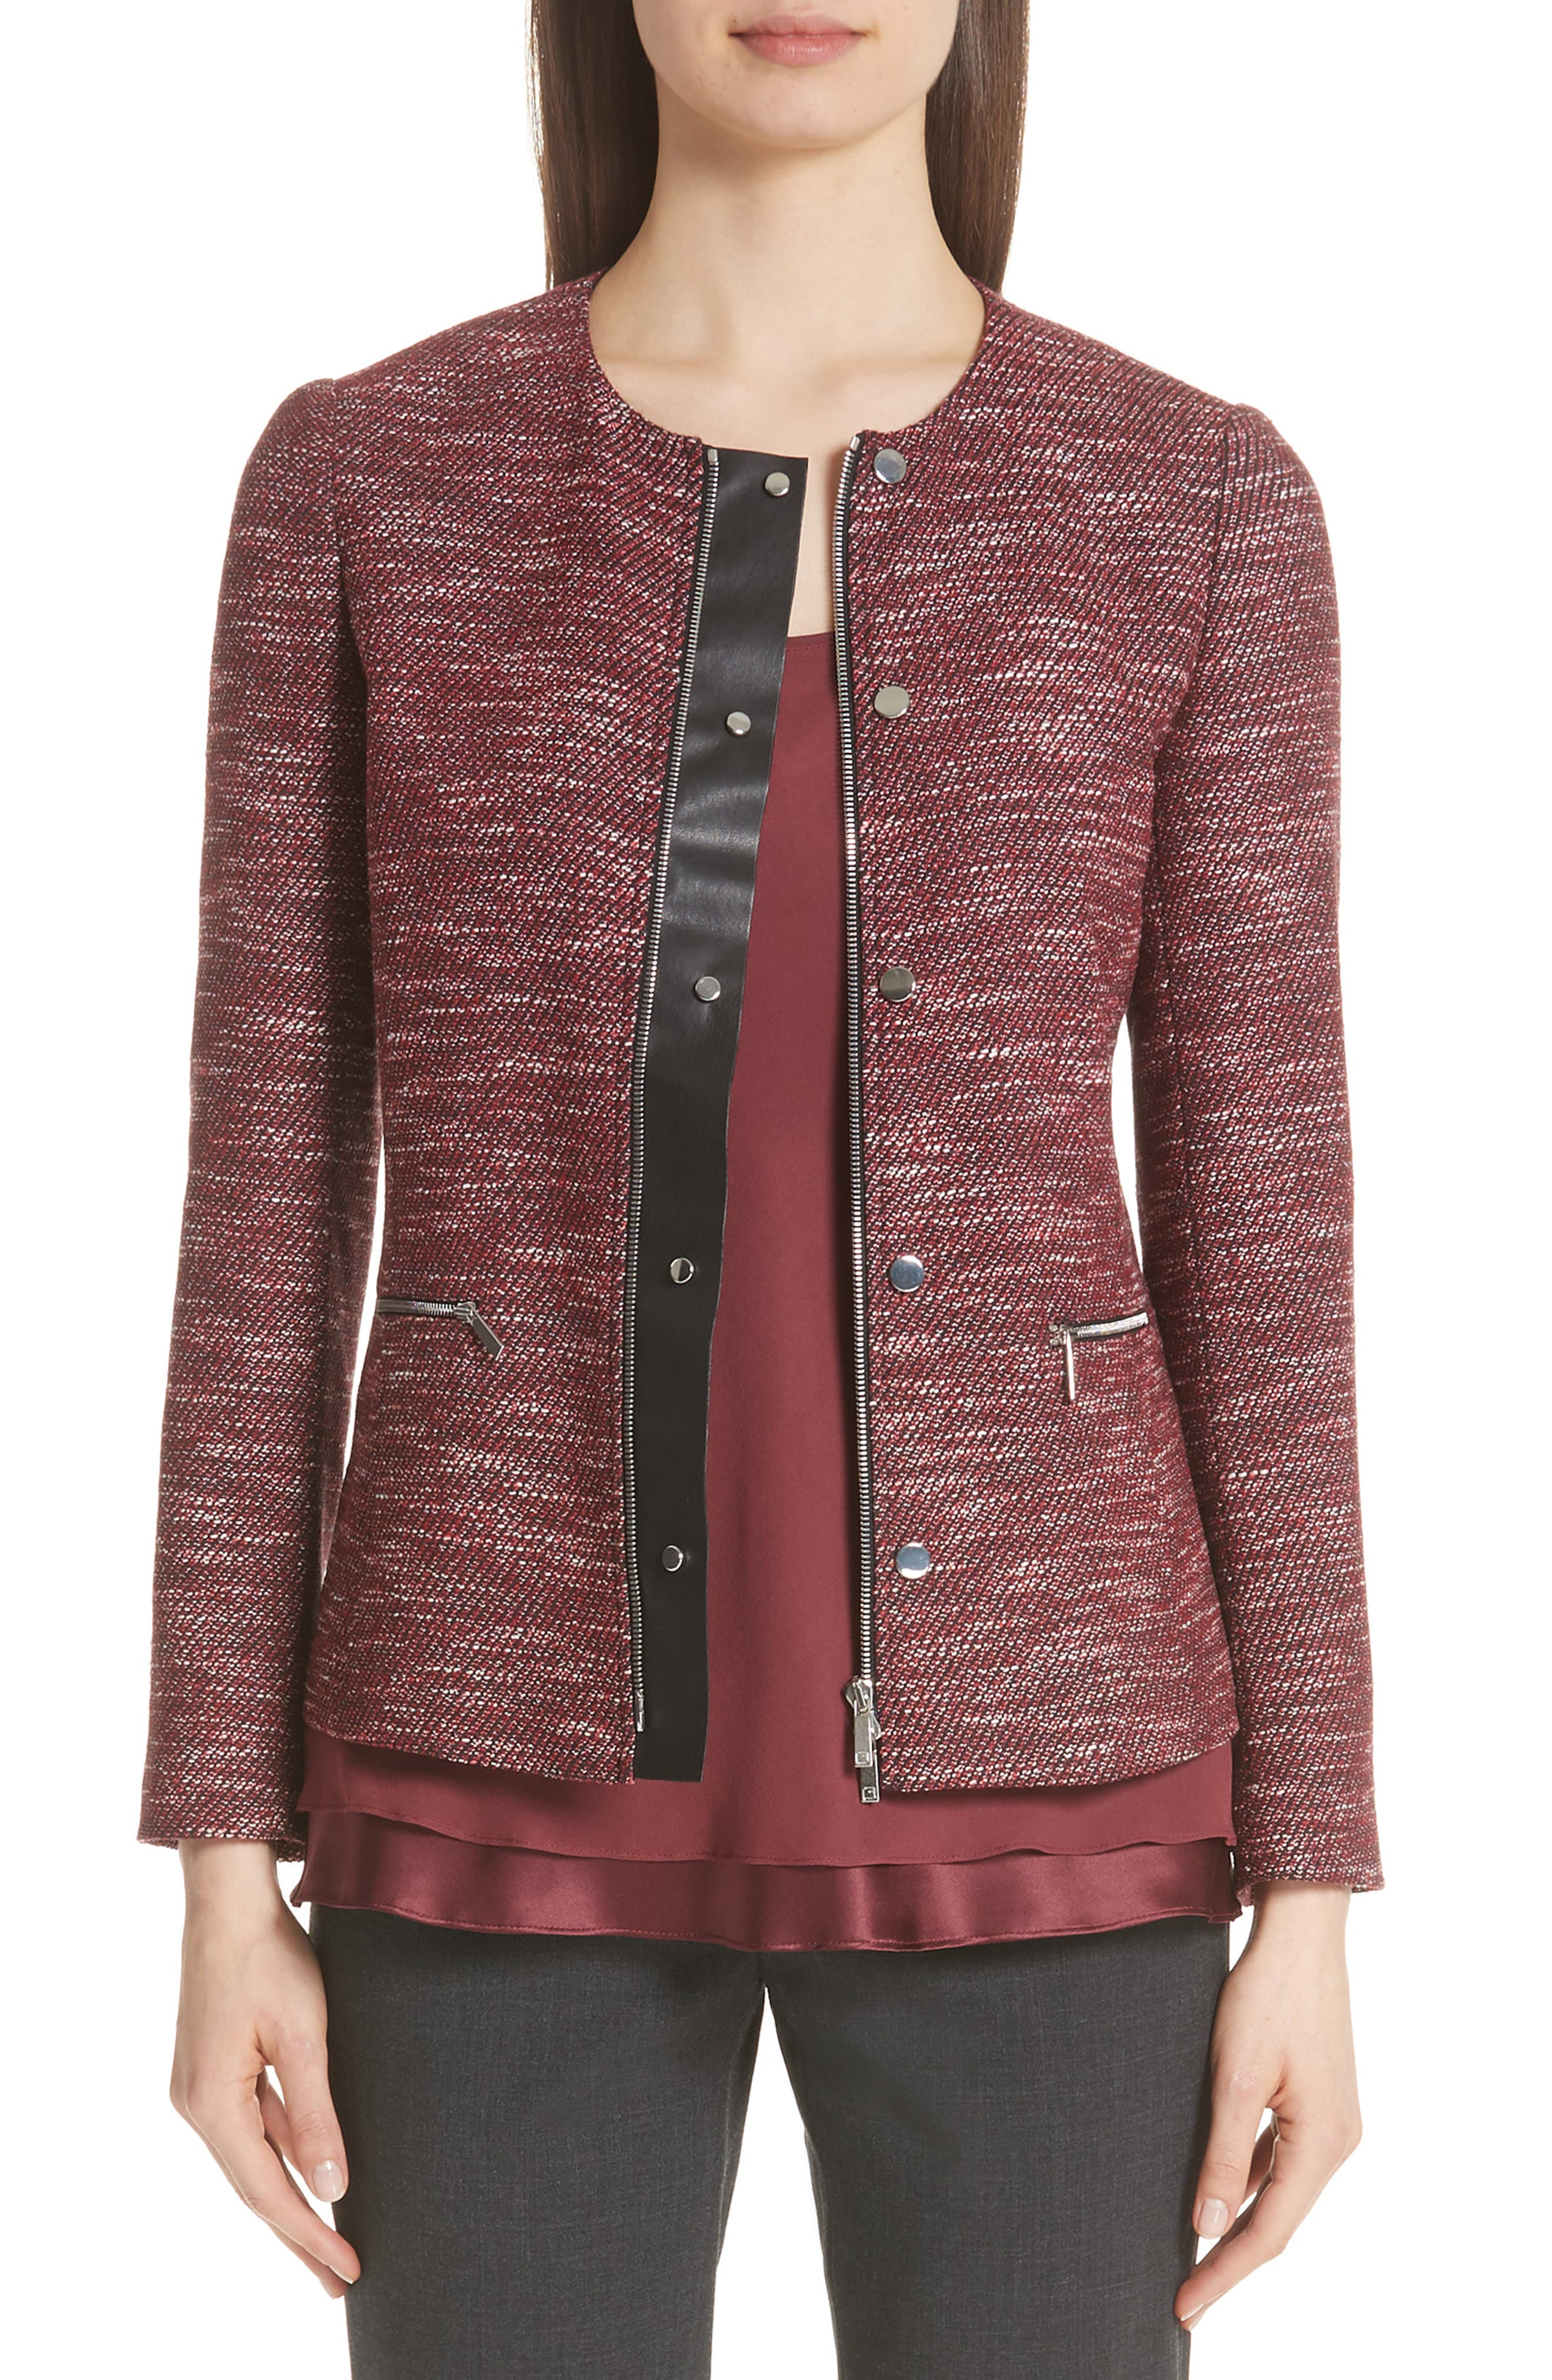 LAFAYETTE 148 NEW YORK Kerrington Wool Blend Jacket, Main, color, 930